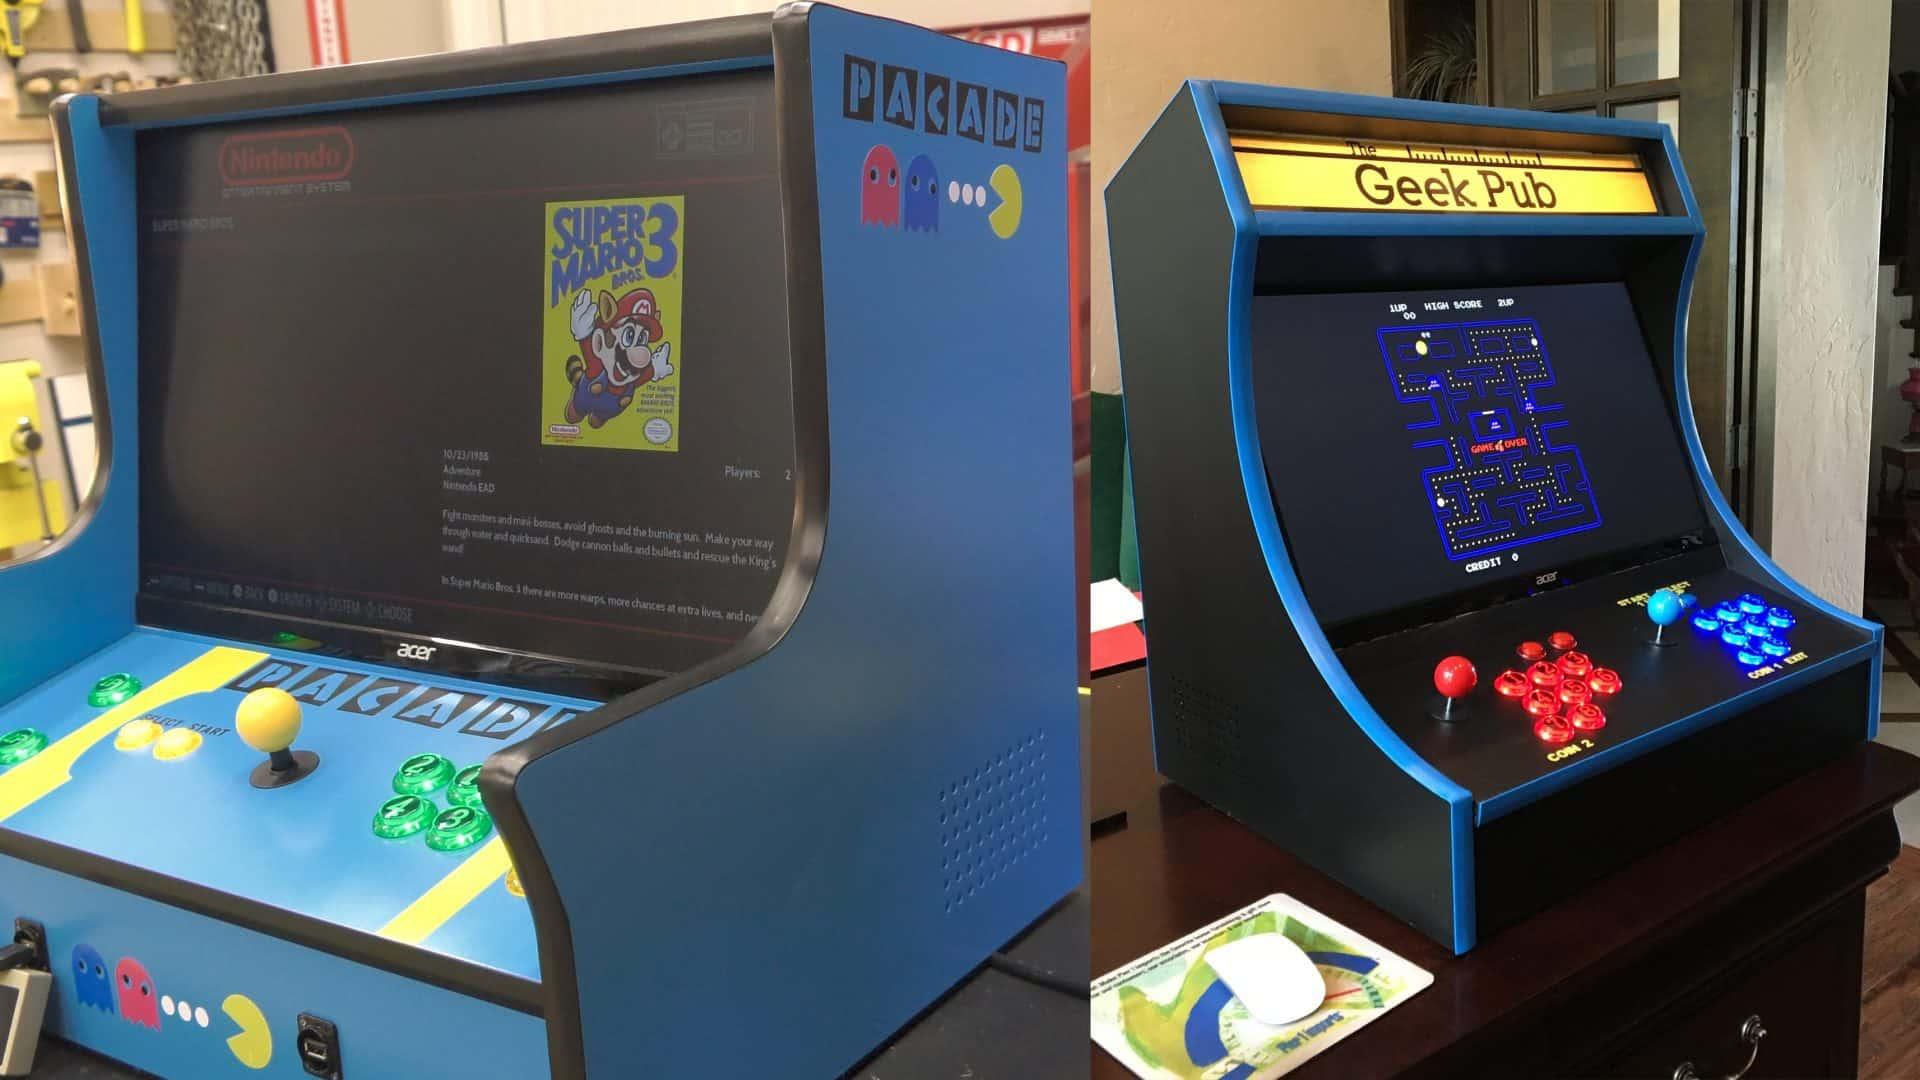 Bartop Arcade Two Plan Bundle The Geek Pub